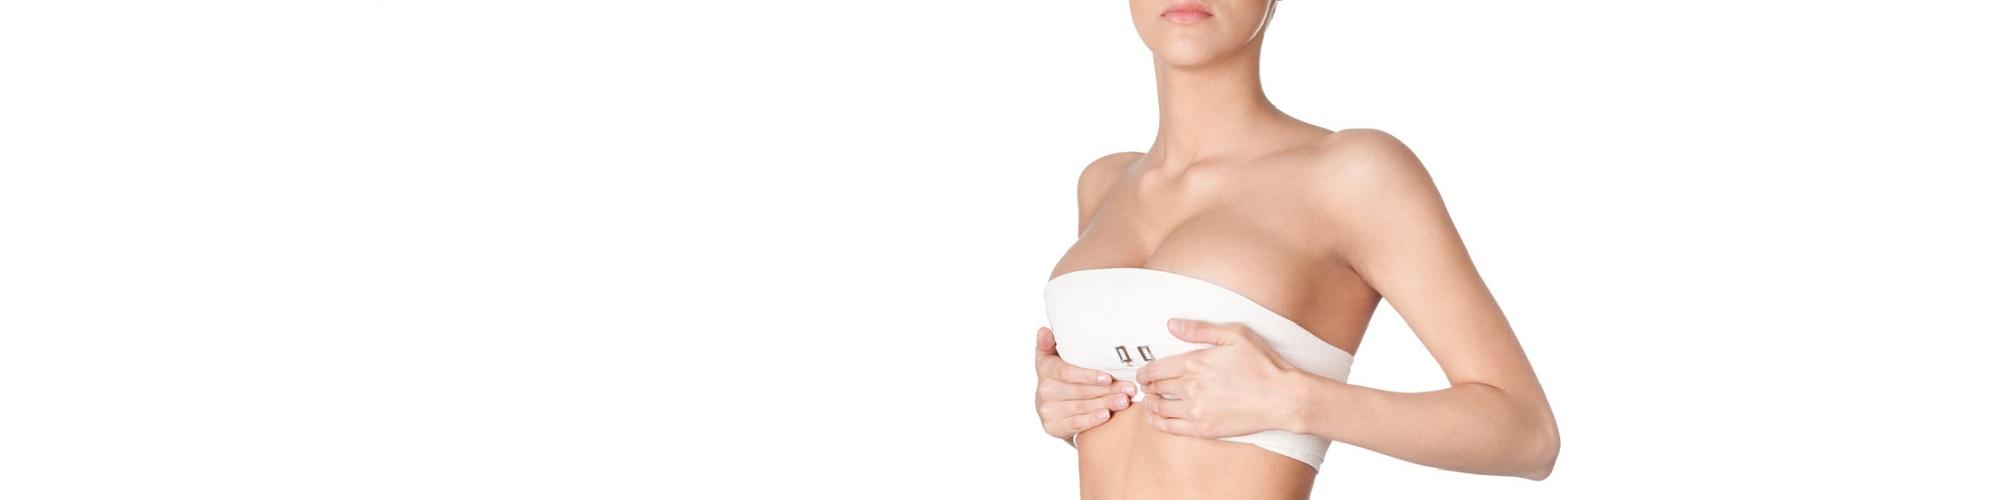 mastoplastica-riduttiva-catania-chirurgia-plastica-youplast